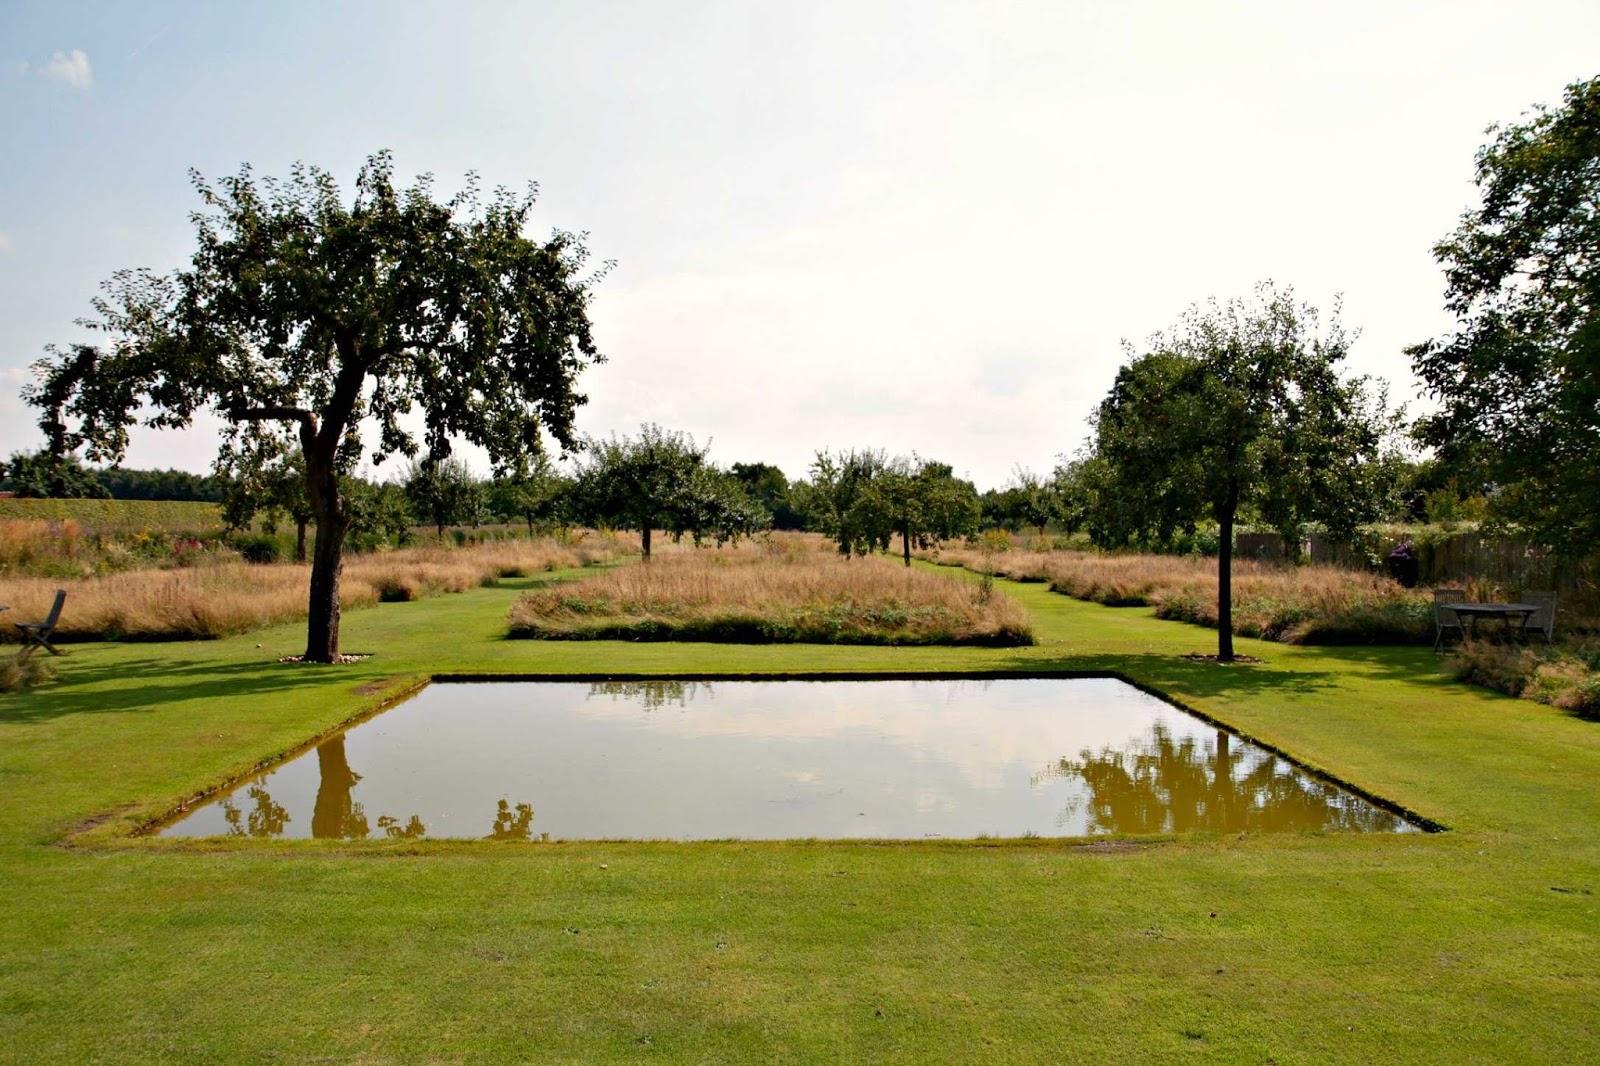 le jardin des poussins escapade normande au jardin plume. Black Bedroom Furniture Sets. Home Design Ideas